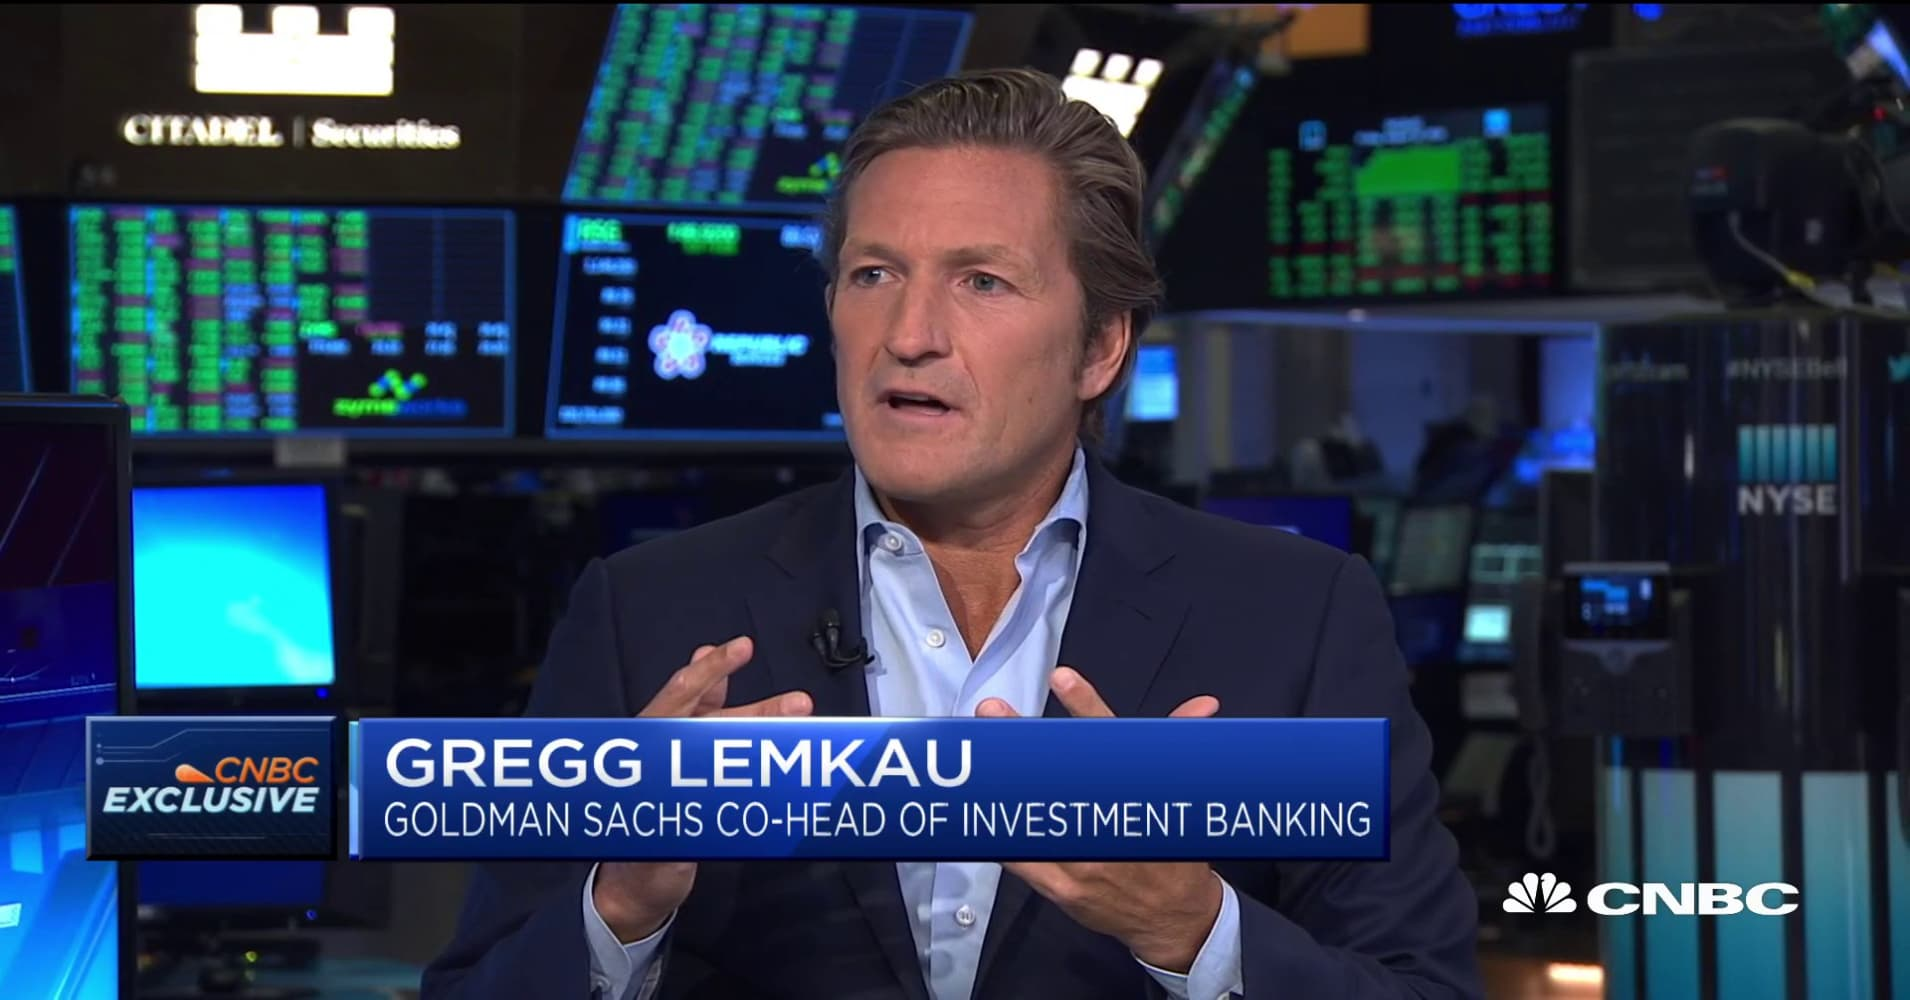 Goldman Sachs' Gregg Lemkau on the IPO market outlook and CBS, Viacom merger